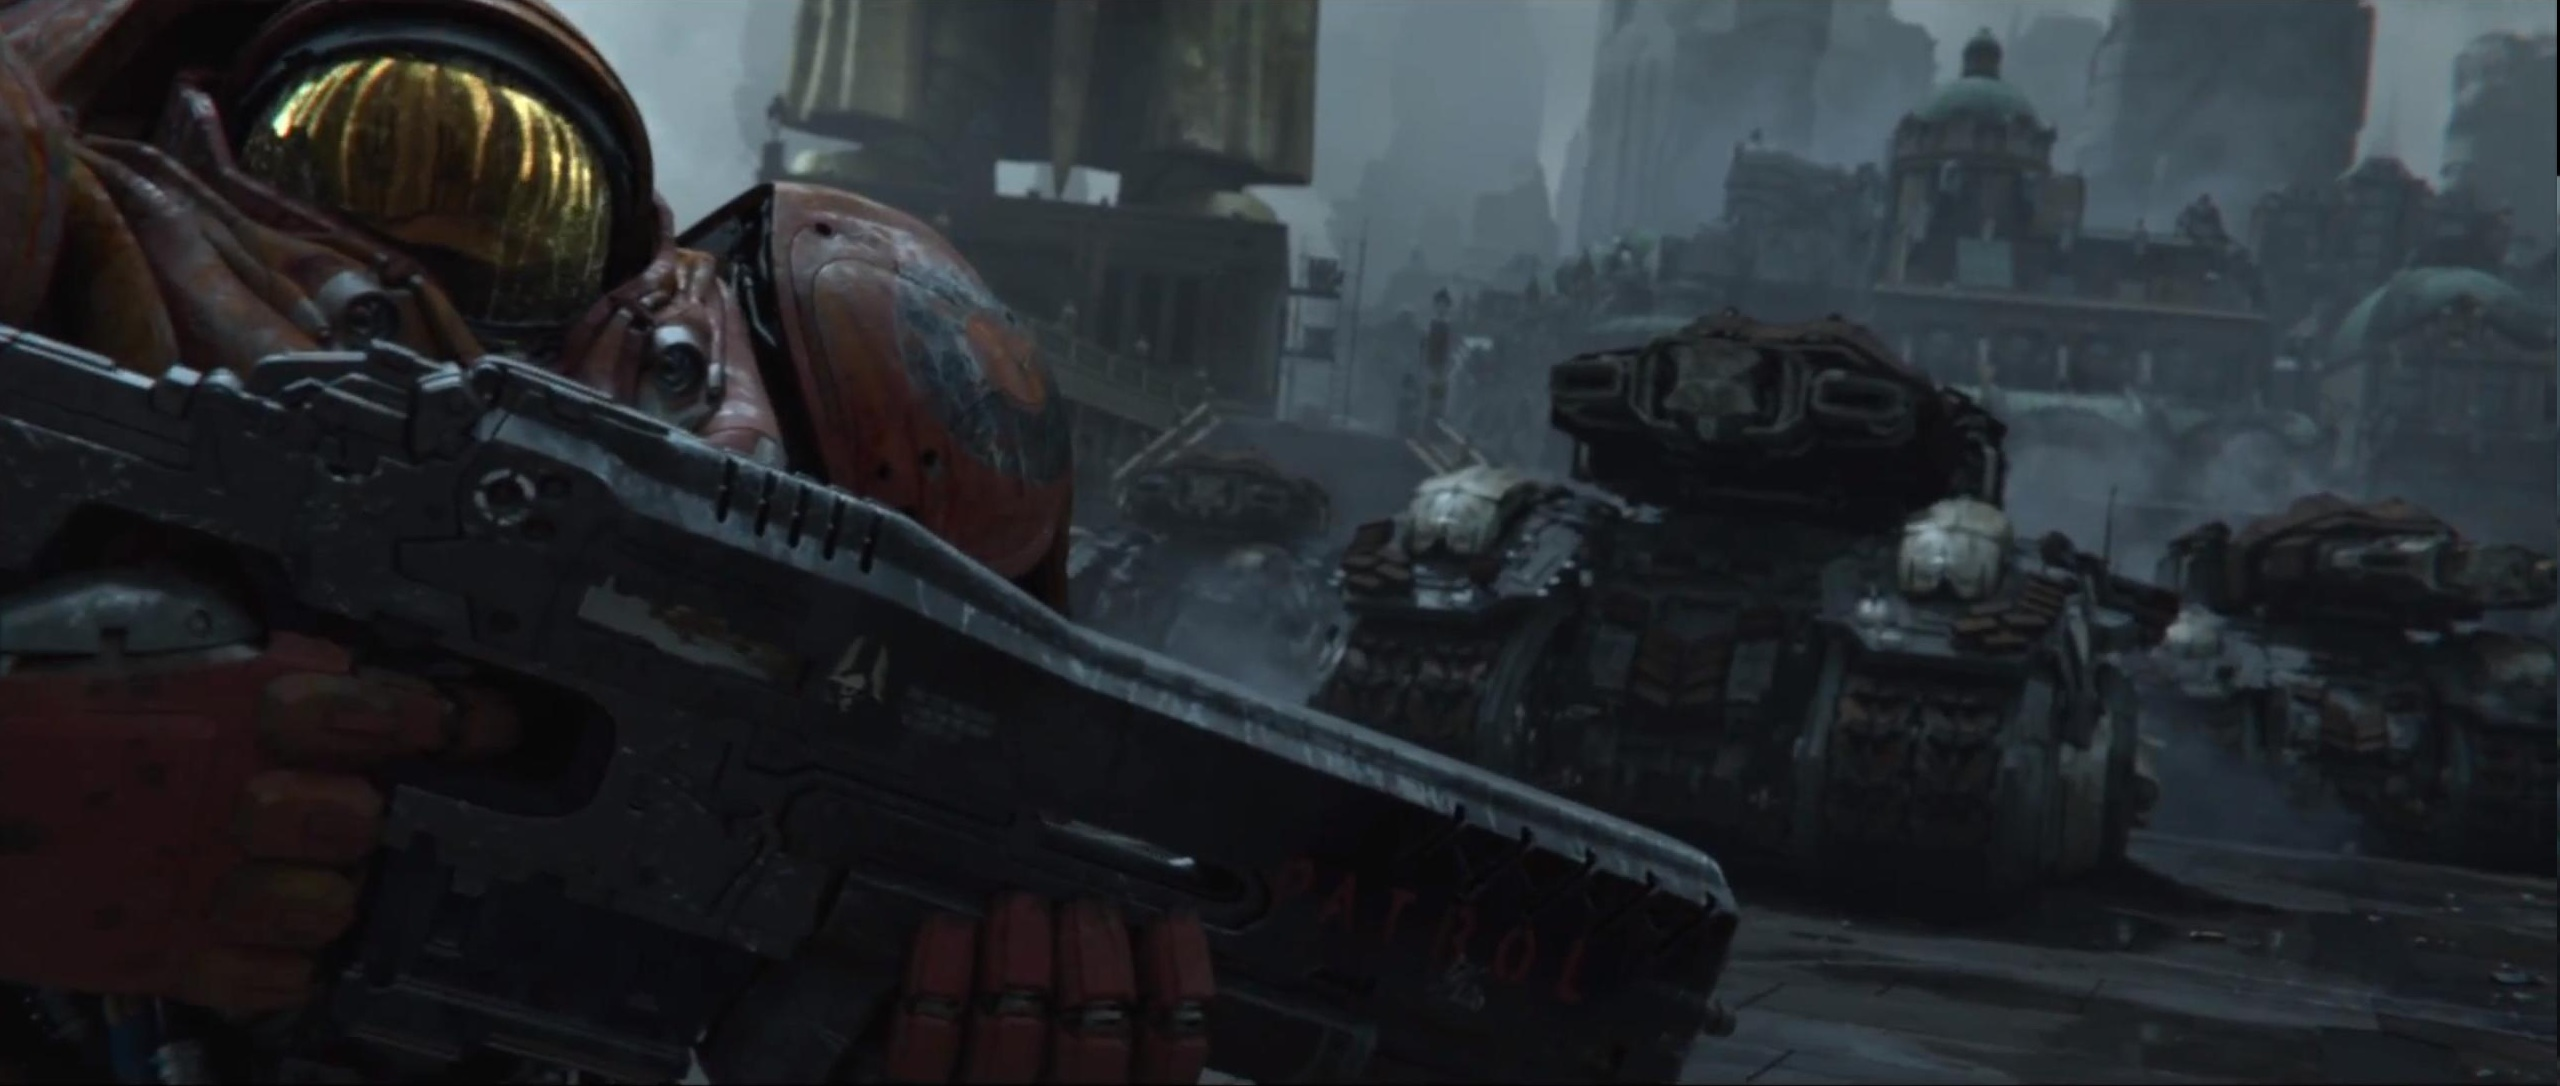 Wings Wallpaper Hd Starcraft Ii Heart Of The Swarm Cinematic Trailer